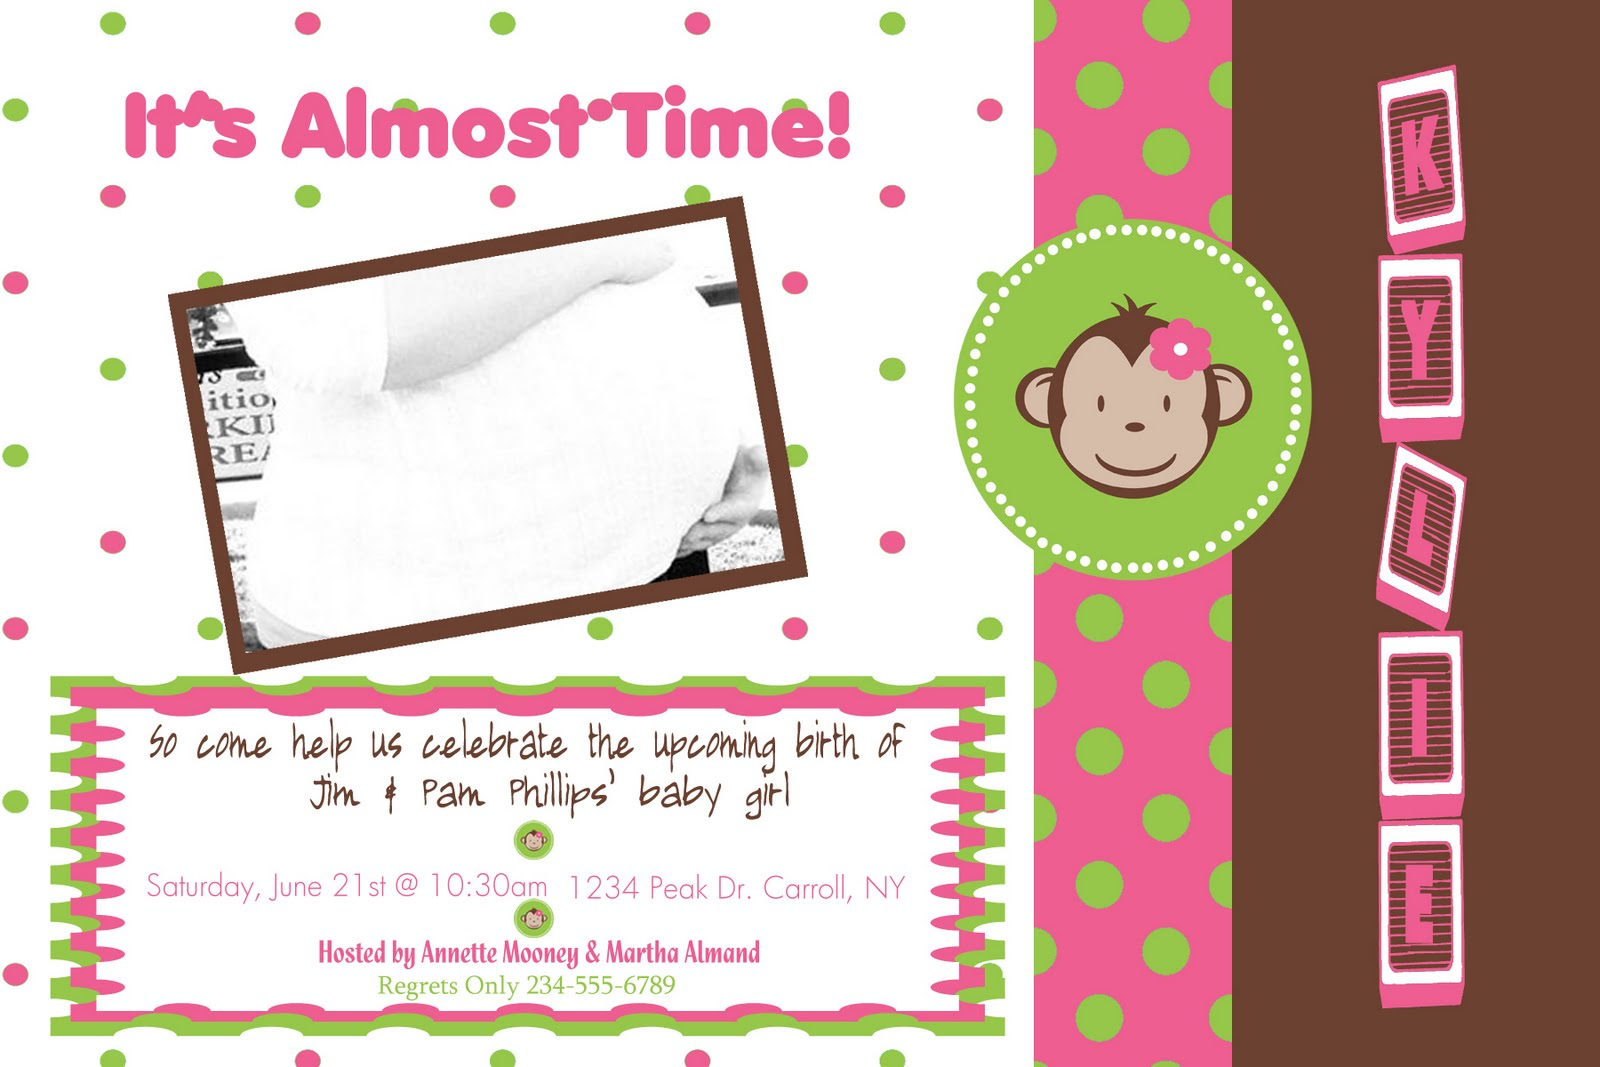 http://1.bp.blogspot.com/_lNNyYNezTR8/TGBlC4jjkxI/AAAAAAAAAFA/Y7qHyJqs2KY/s1600/mod+monkey+pink+grn+brown+baby+shower+landscape.jpg